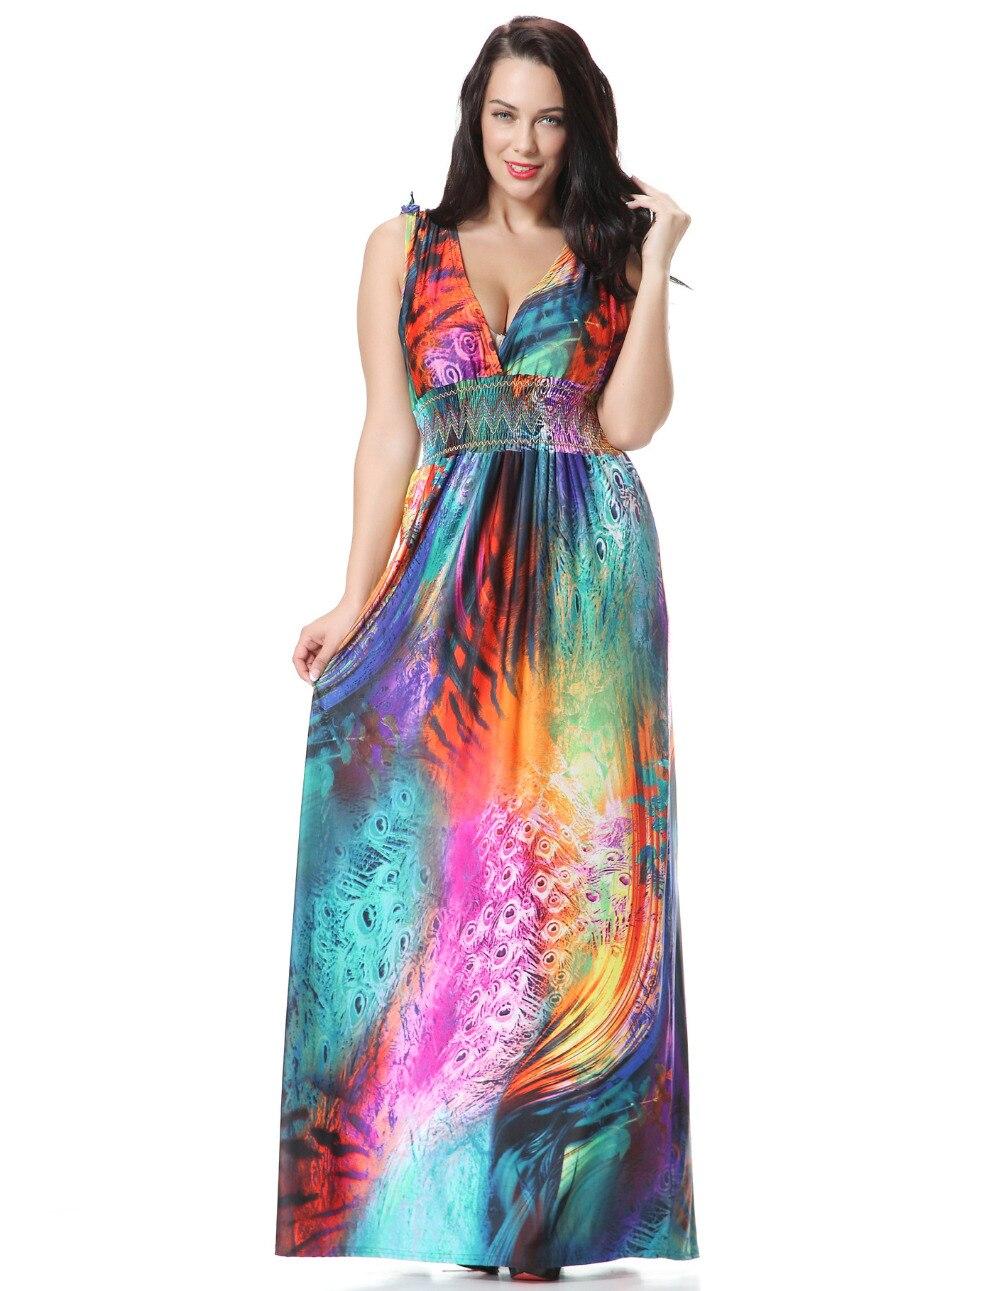 2018 Women Summer Holiday Beach Dress Plus Size 7XL Printed Long Maxi Dress Elbise Robe ete Jurk ...